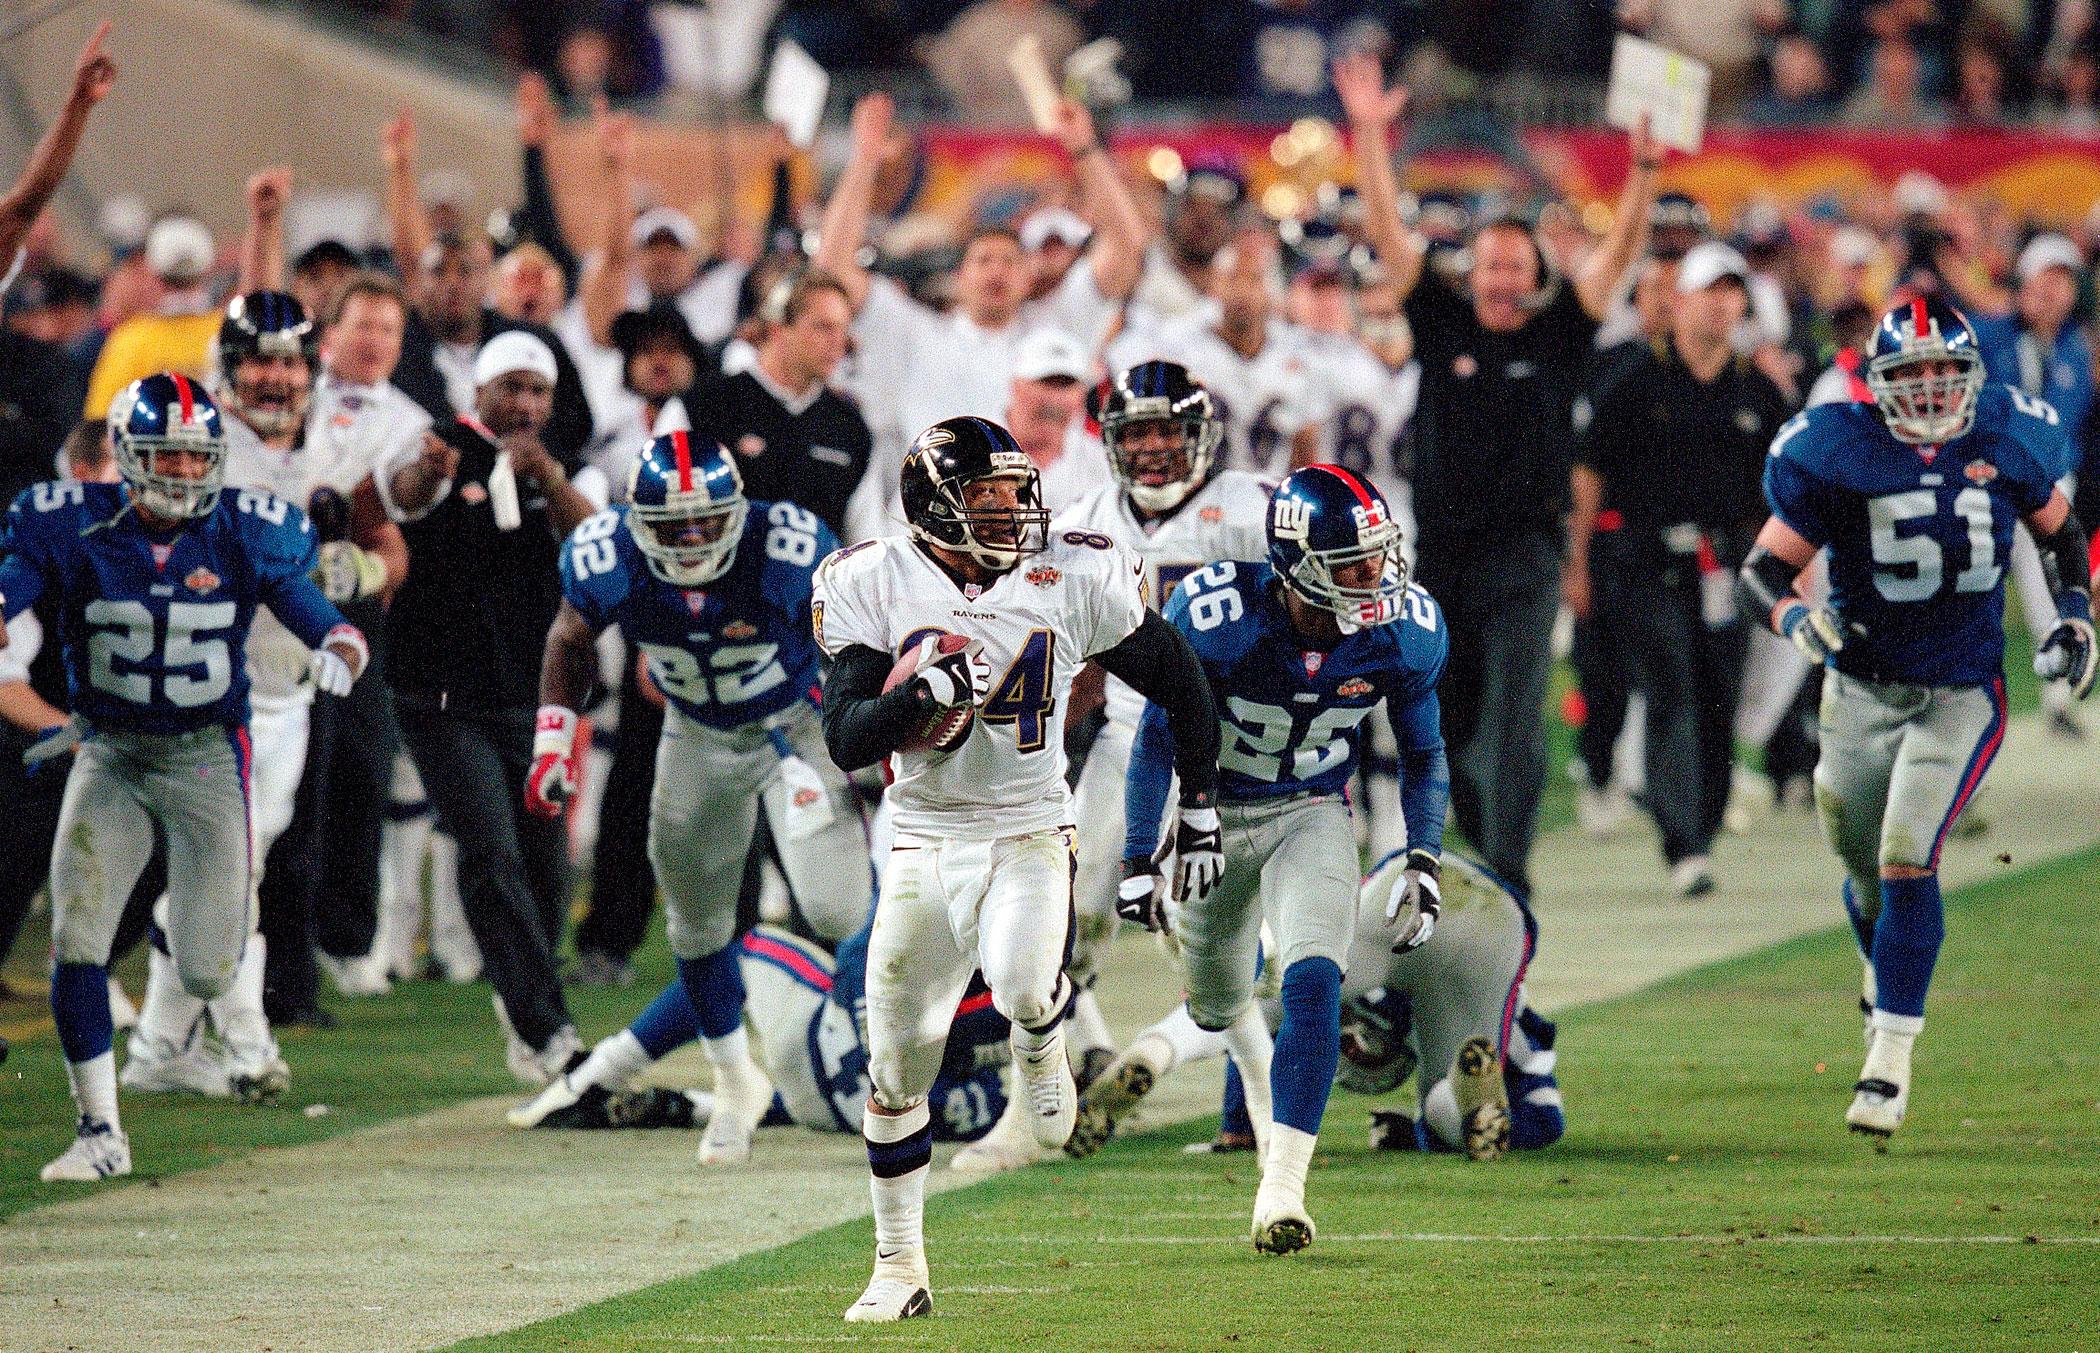 Super Bowl XXXV, Jan. 28, 2001                               Baltimore Ravens vs New York Giants in Tampa, Fla.